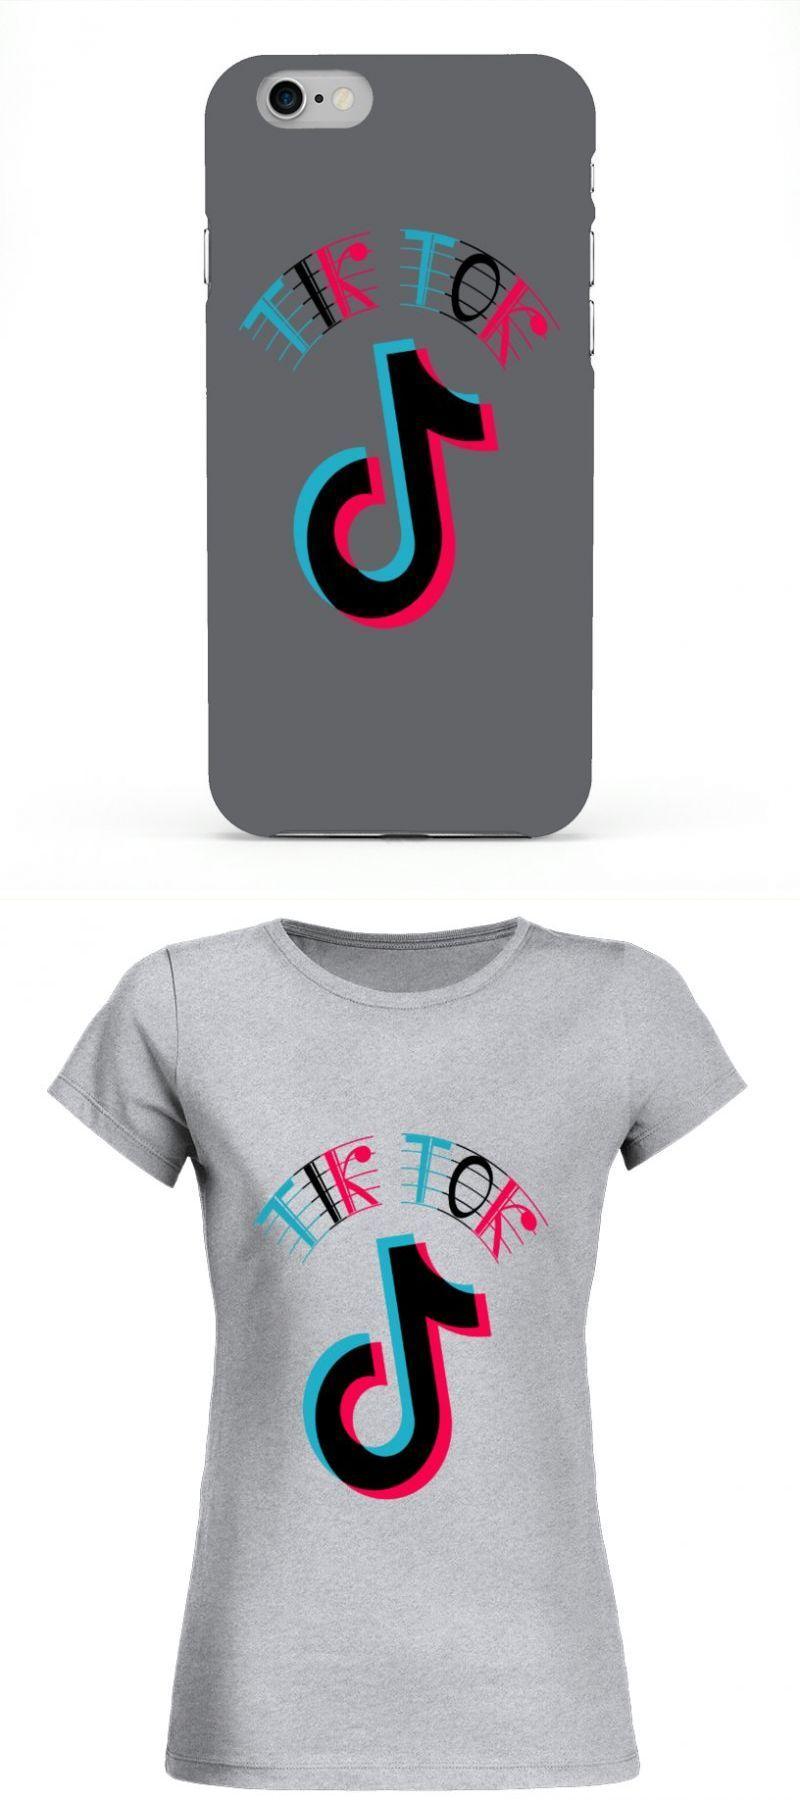 adbe3071b18e Tik tok shirt kids girls tok tok t-shirt floss dance t shirt kids #tik #tok  #shirt #kids #girls #t-shirt #floss #dance #shirts #for #women #iphone  #case ...